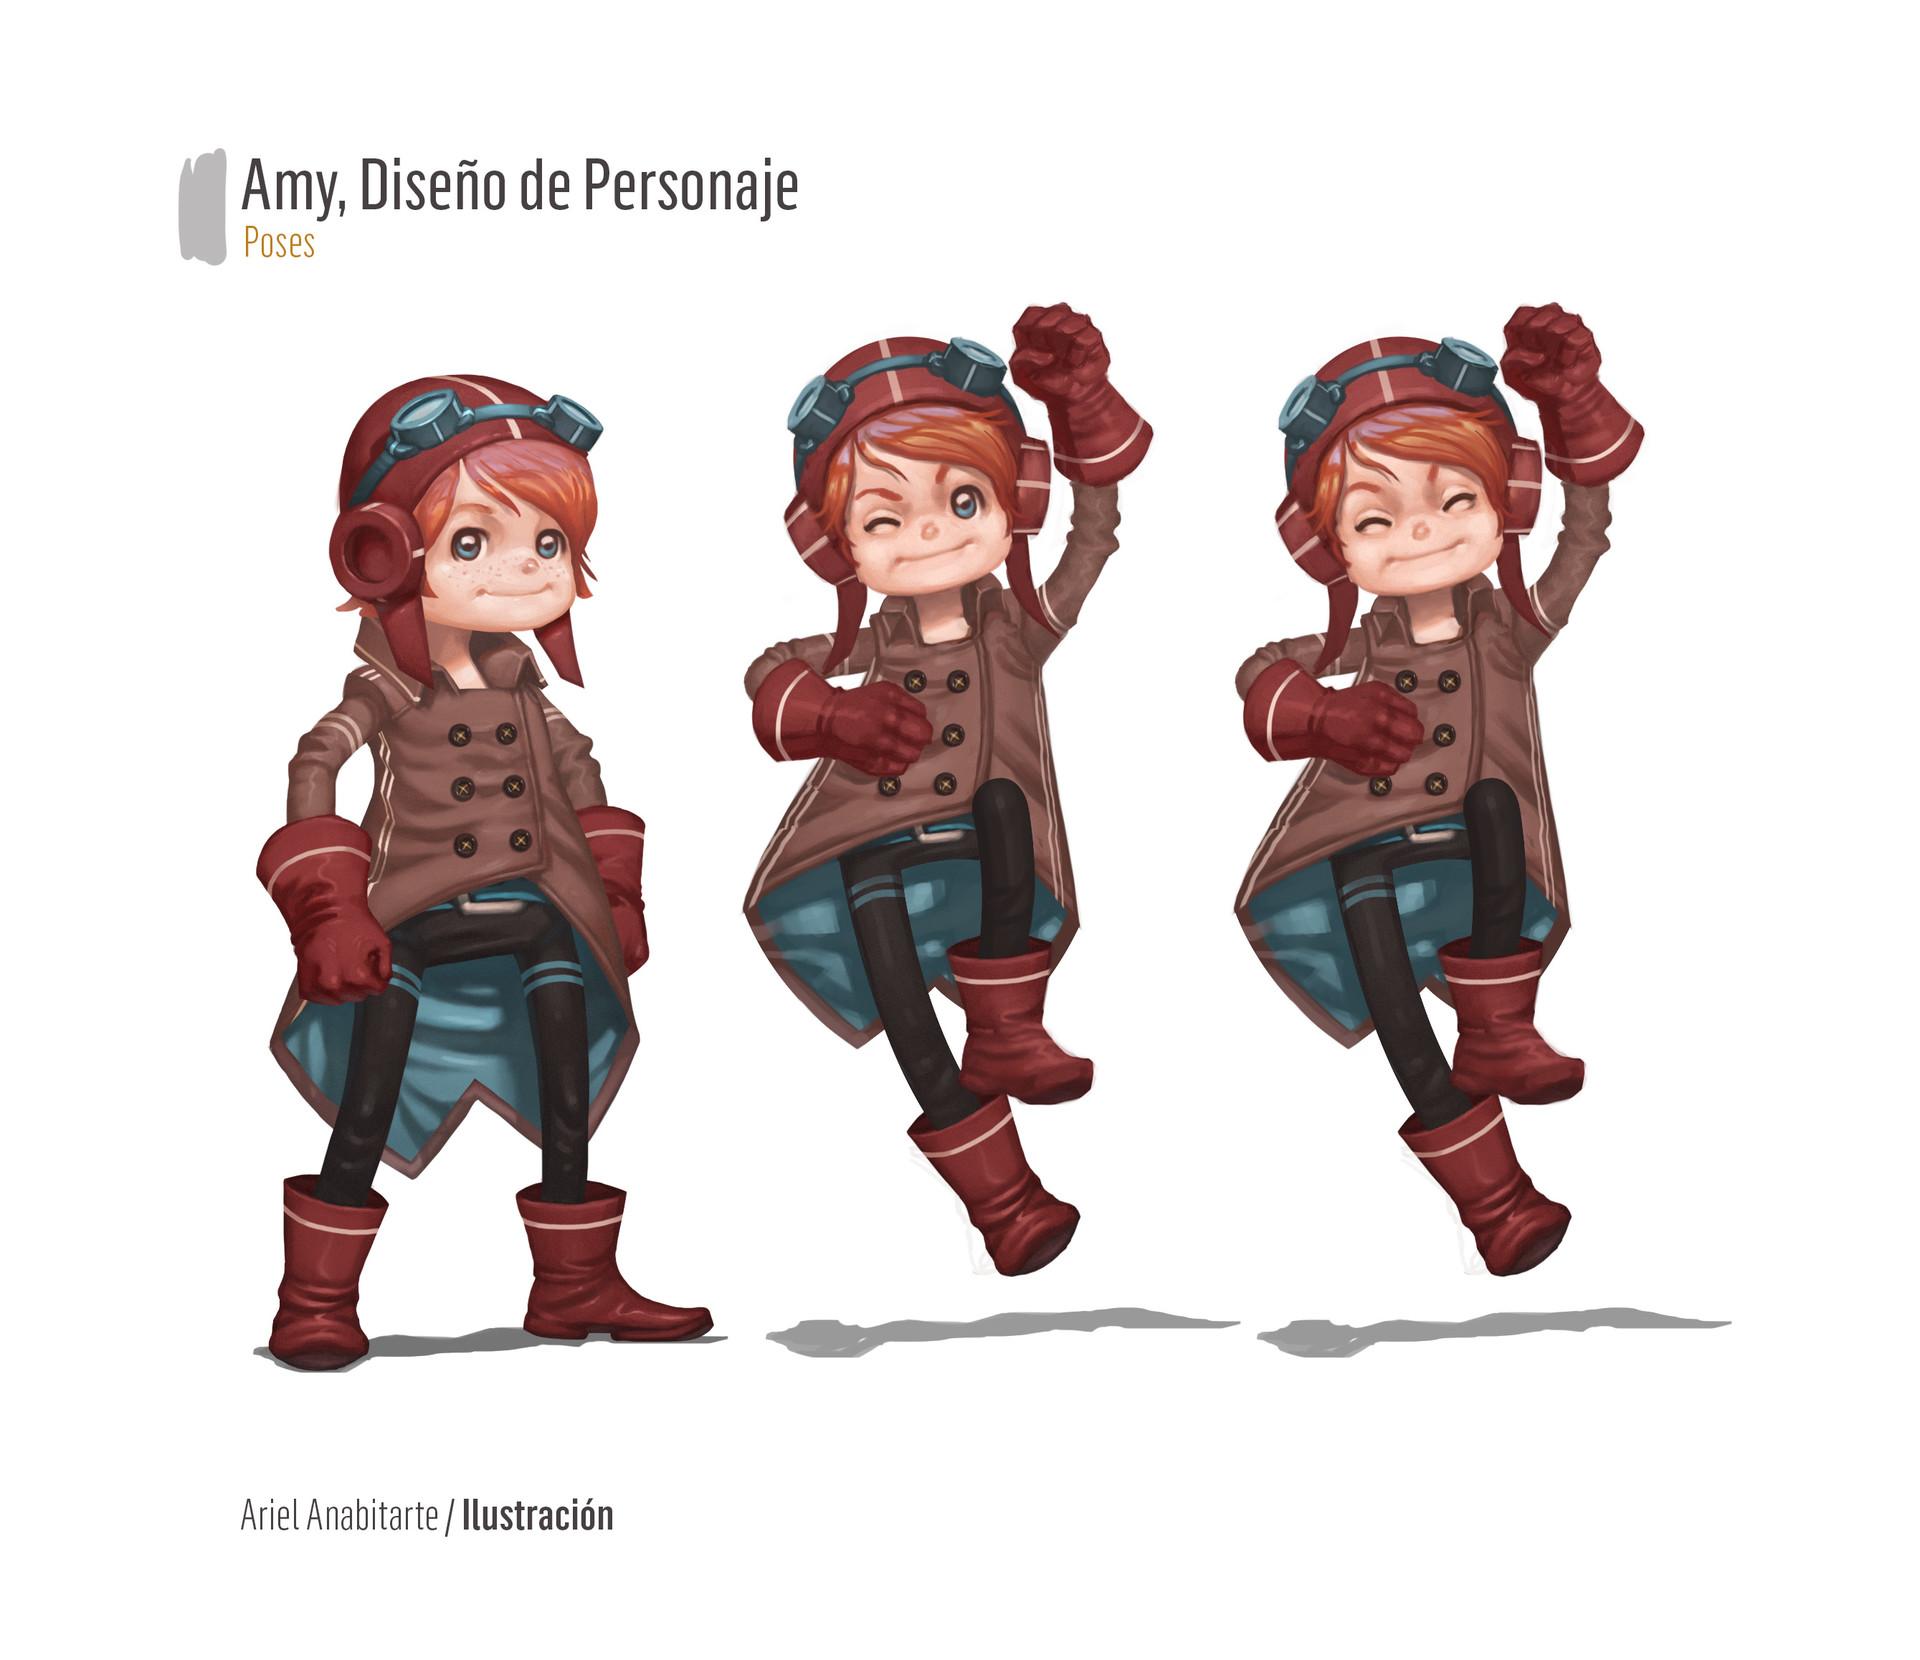 Ariel anabitarte personaje02 poses